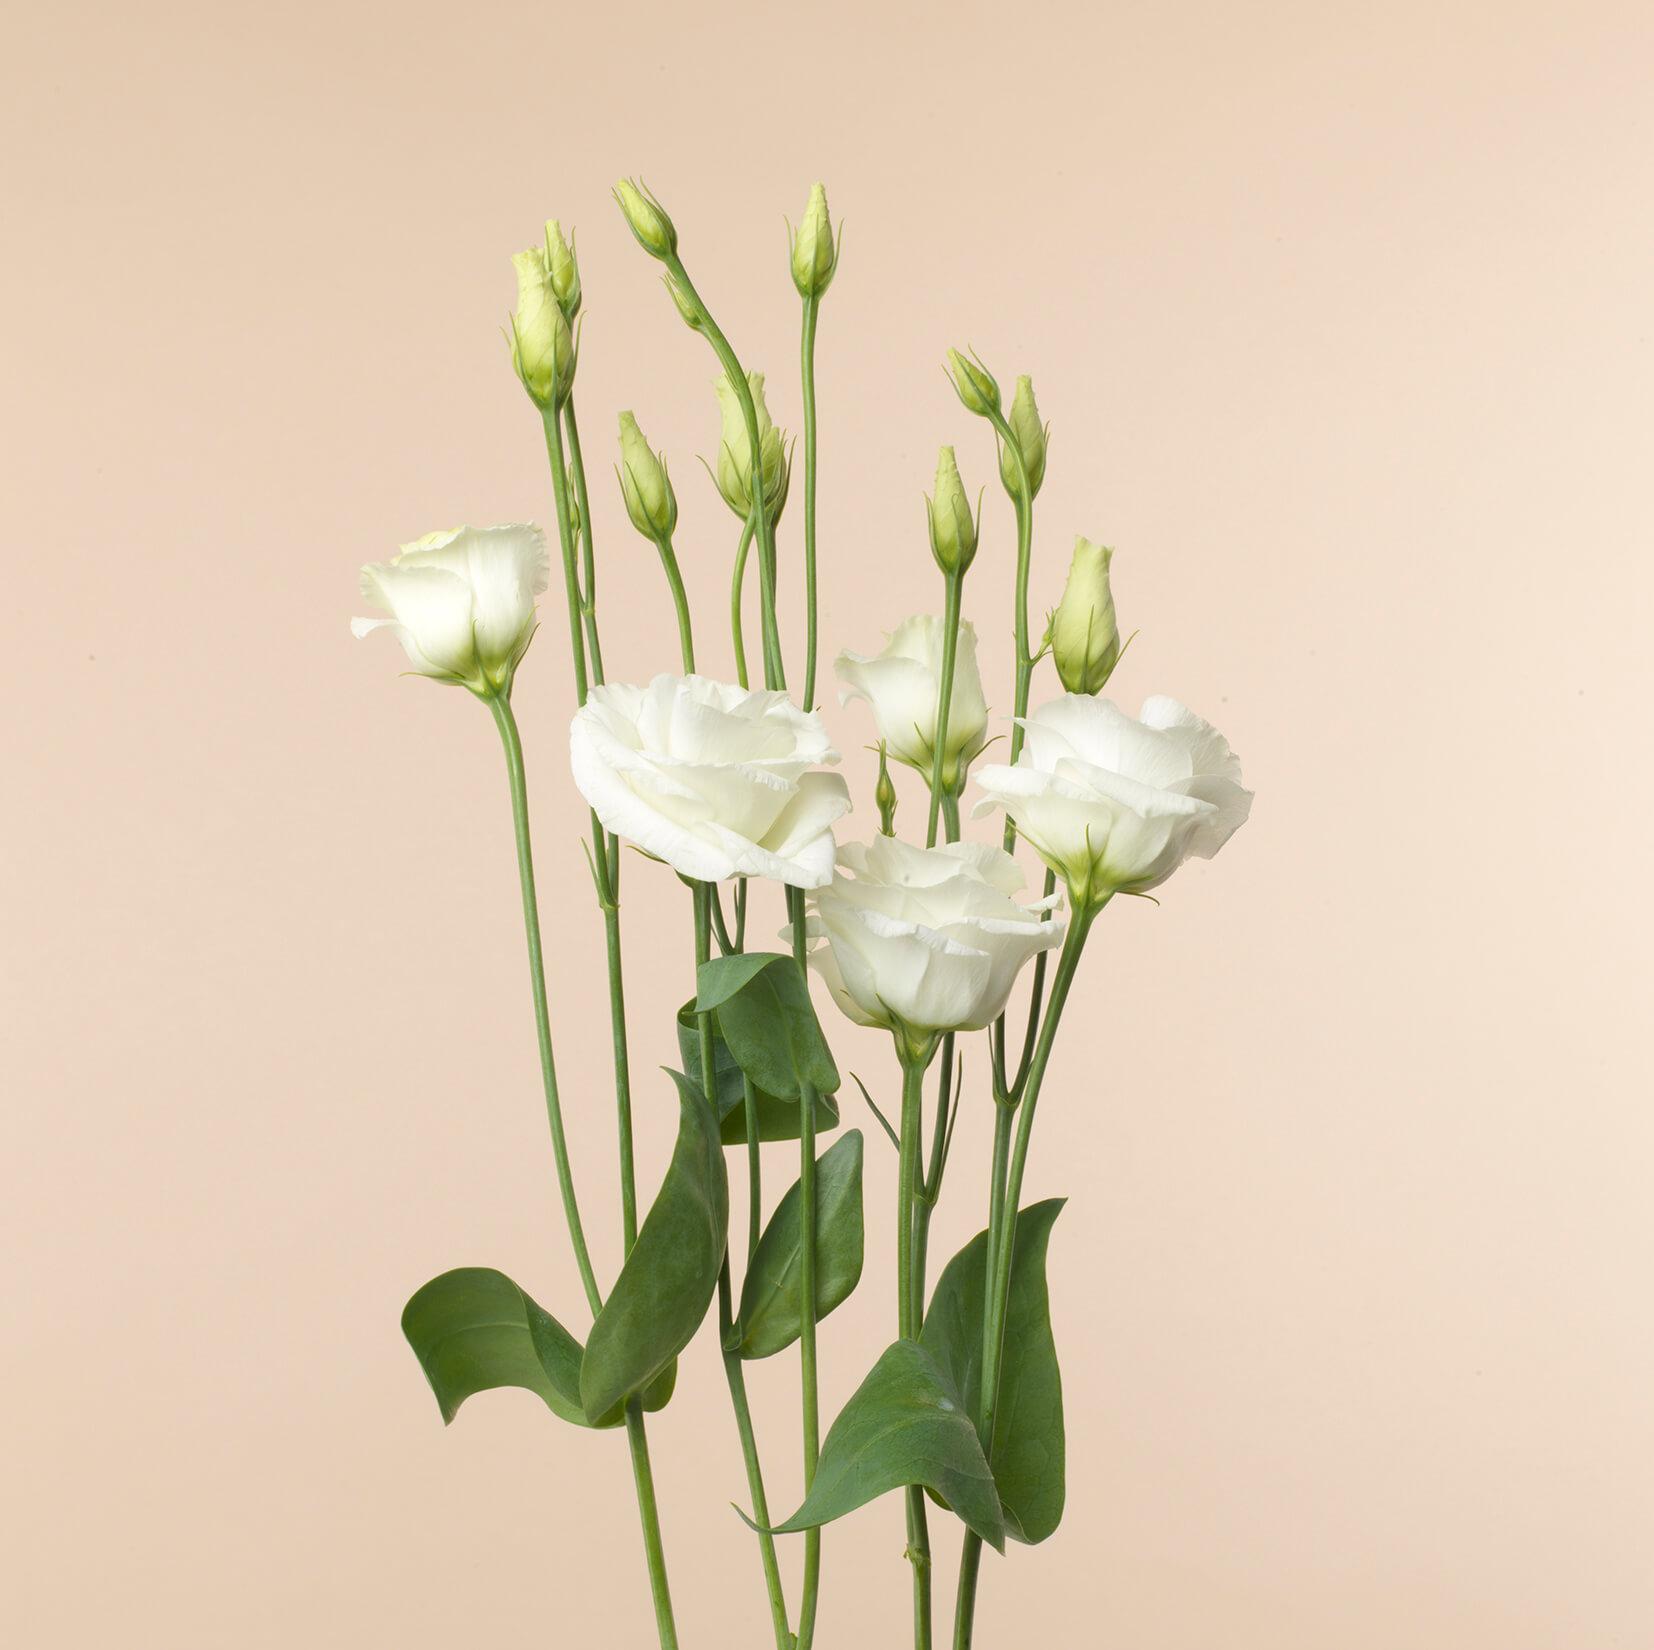 Offrande Petites fleurs 4072